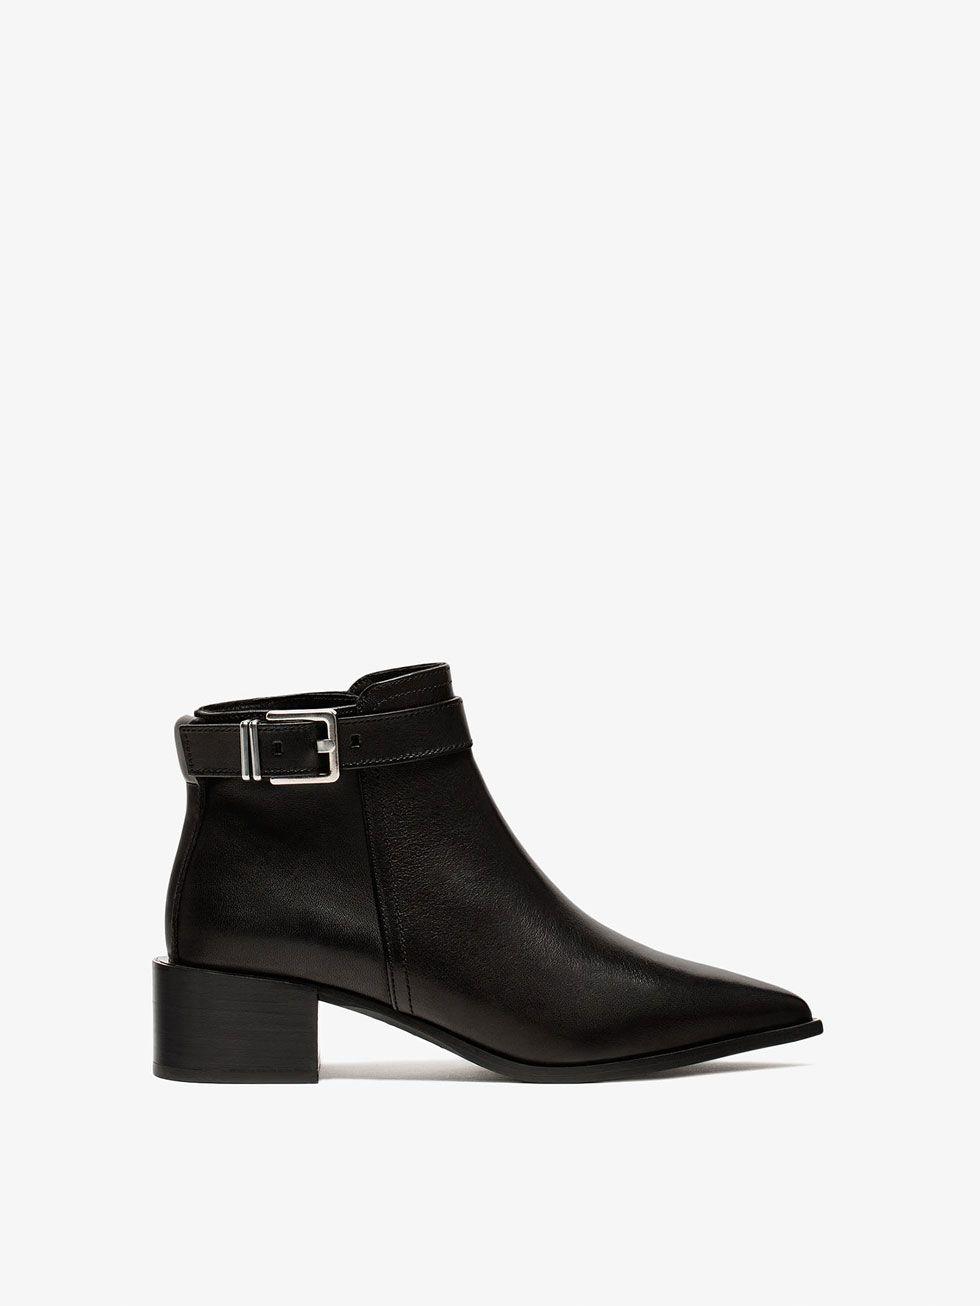 Mujer Massimo Dutti Botines Zapatos EspañaEn srdhQCt